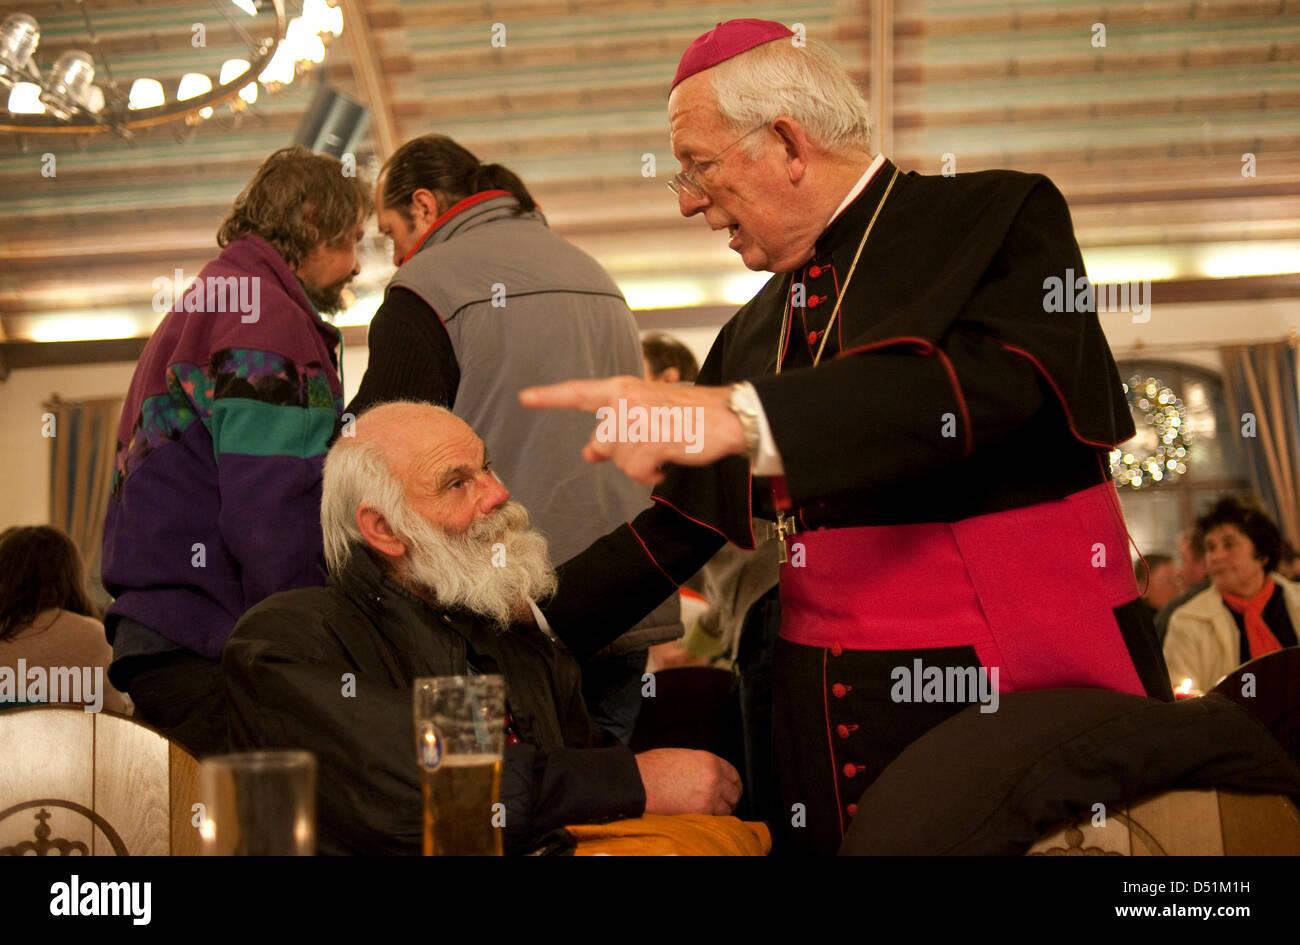 Munich suffragan bishop Engelbert Siebler (R) talks to a homeless man at Hofbraeuhaus inMunich, Germany, 24December - Stock Image